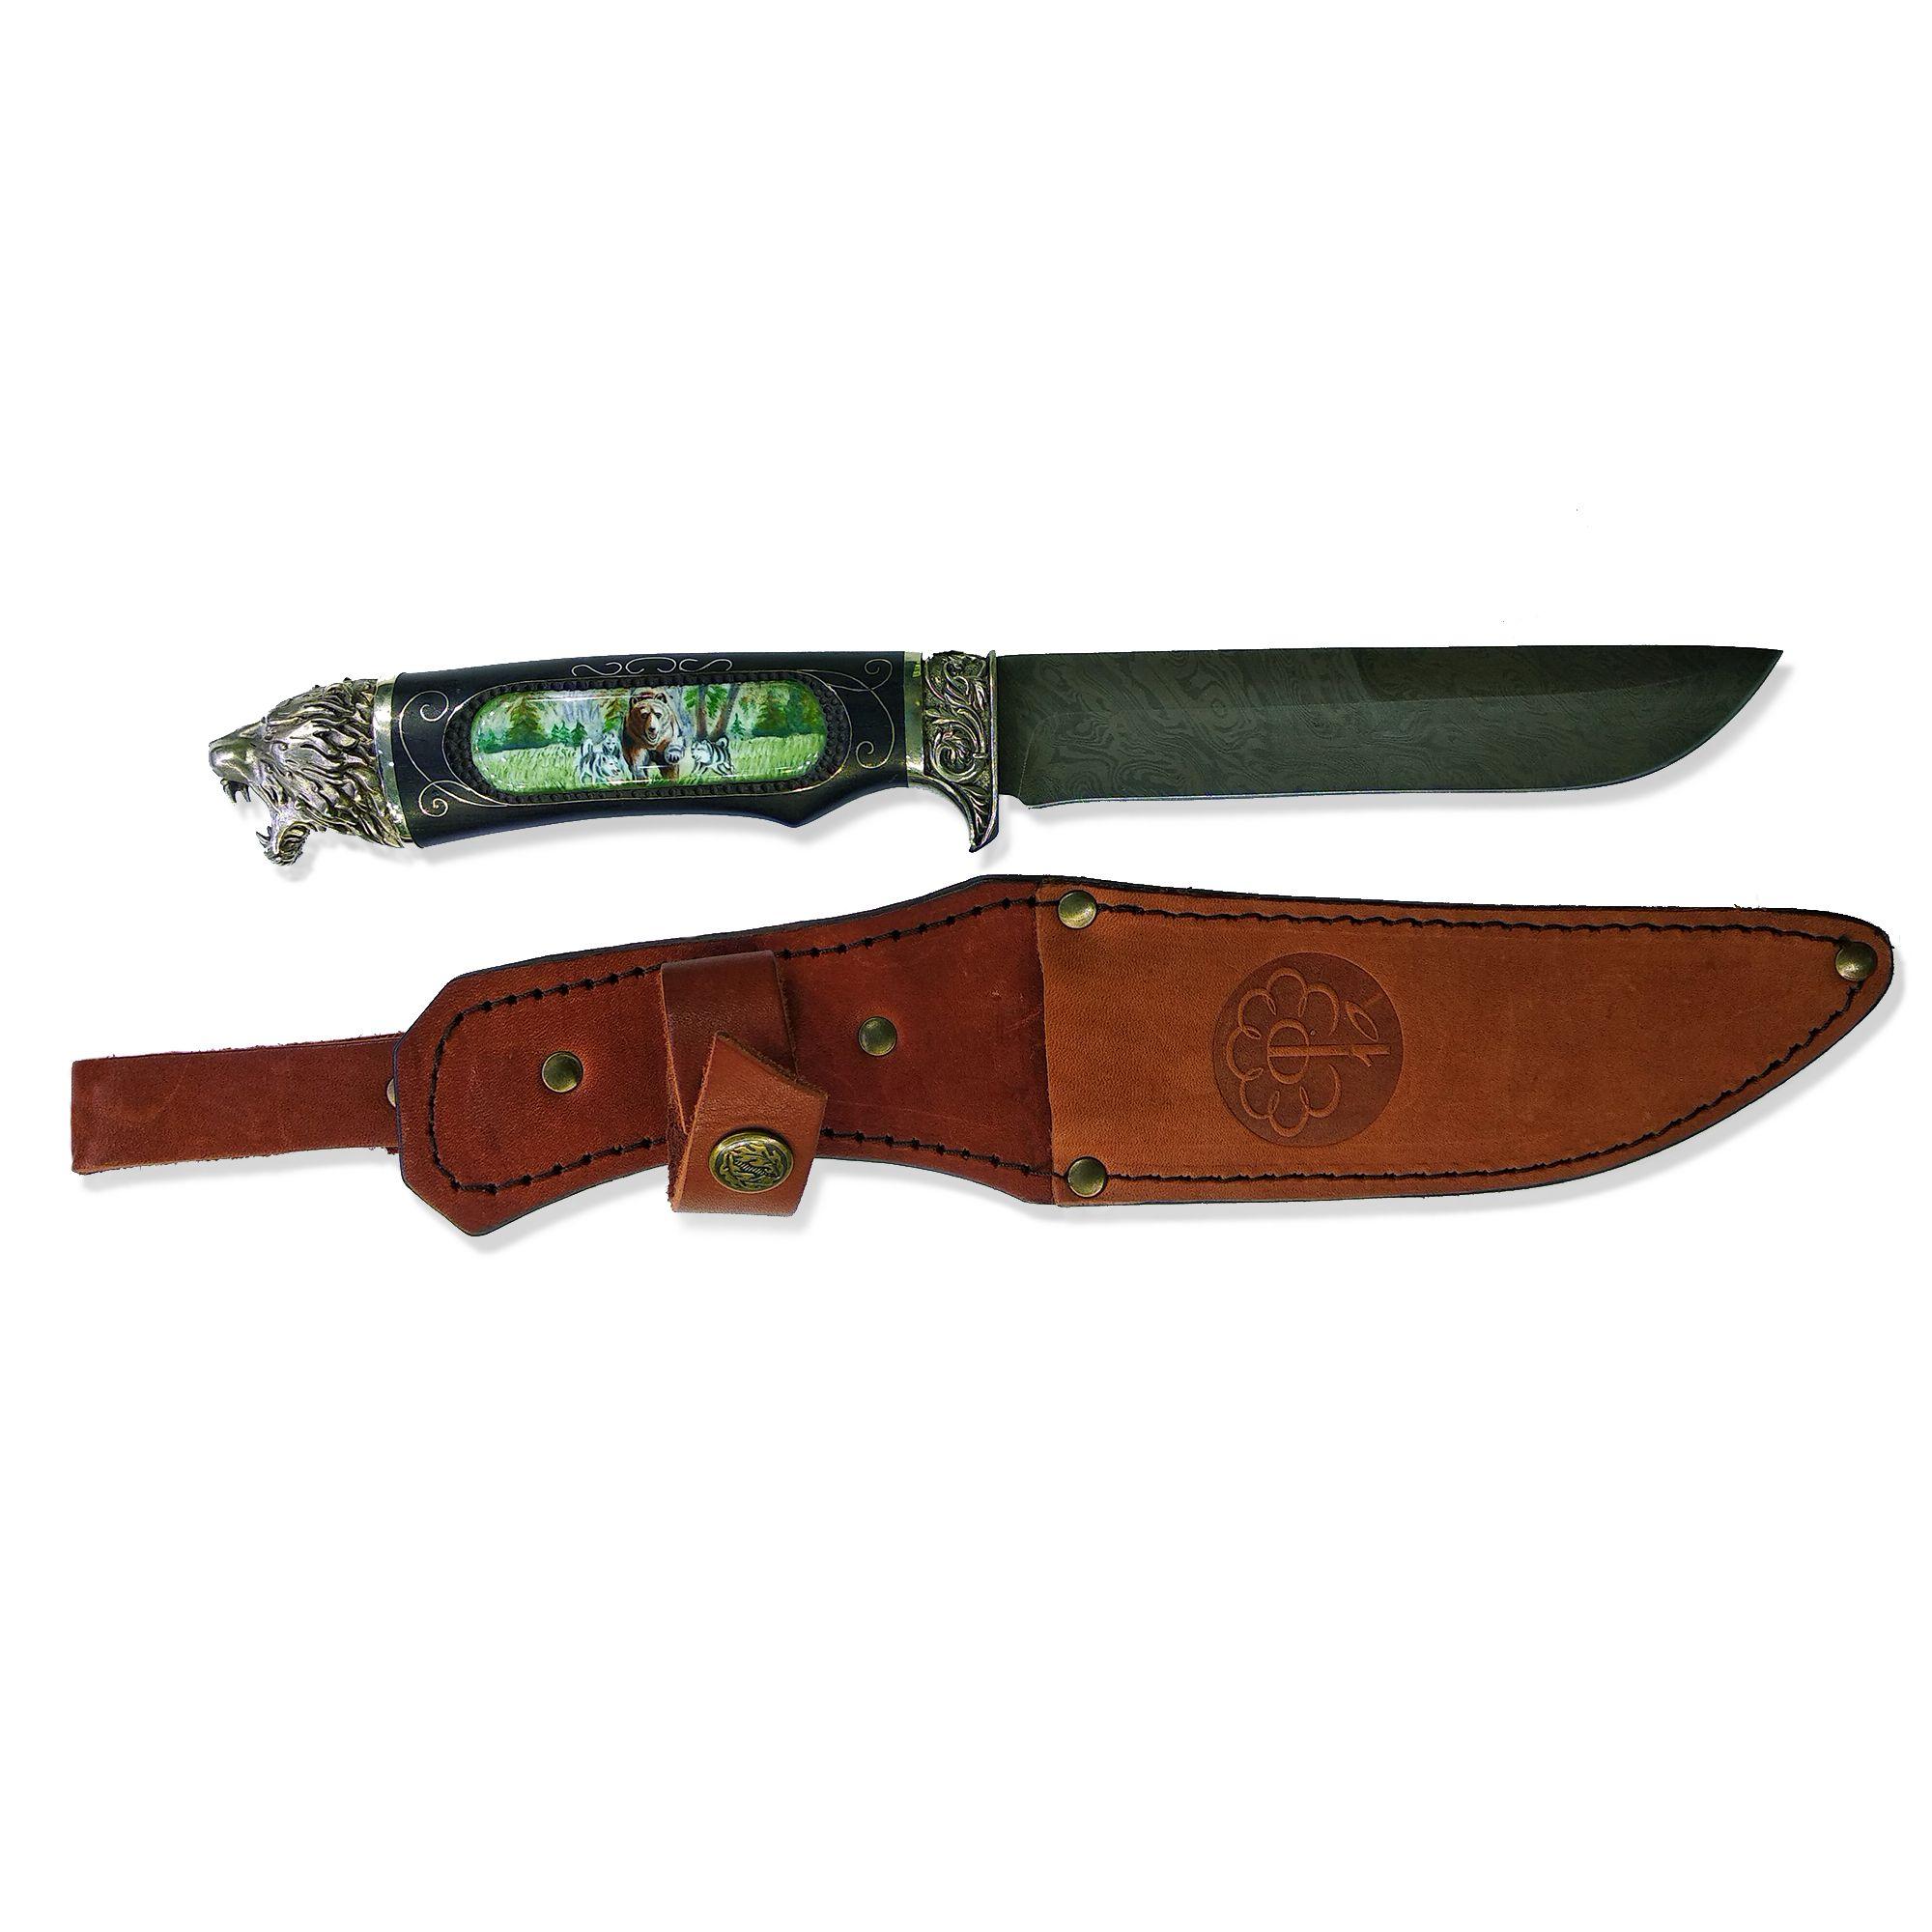 Rostov enamel / Hunter's knife